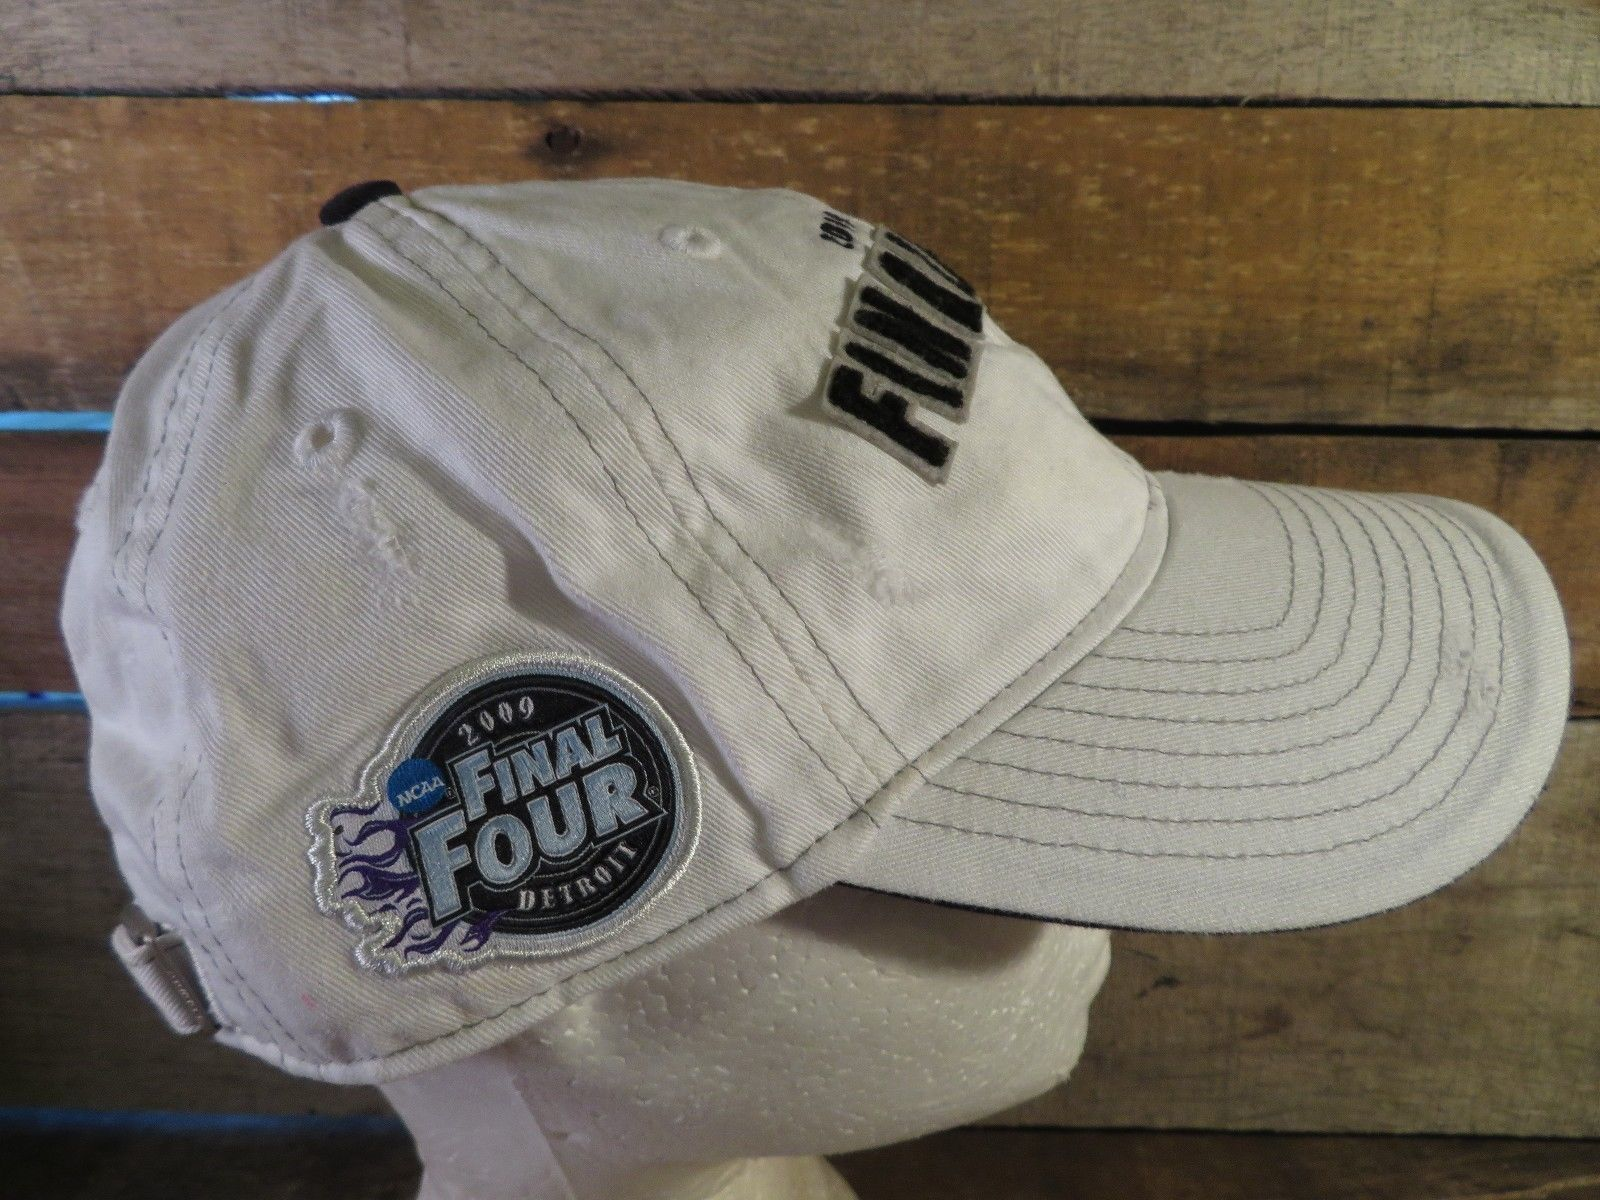 FINAL FOUR 2009 NCAA Detroit Adidas Adjustable Adult Cap Hat